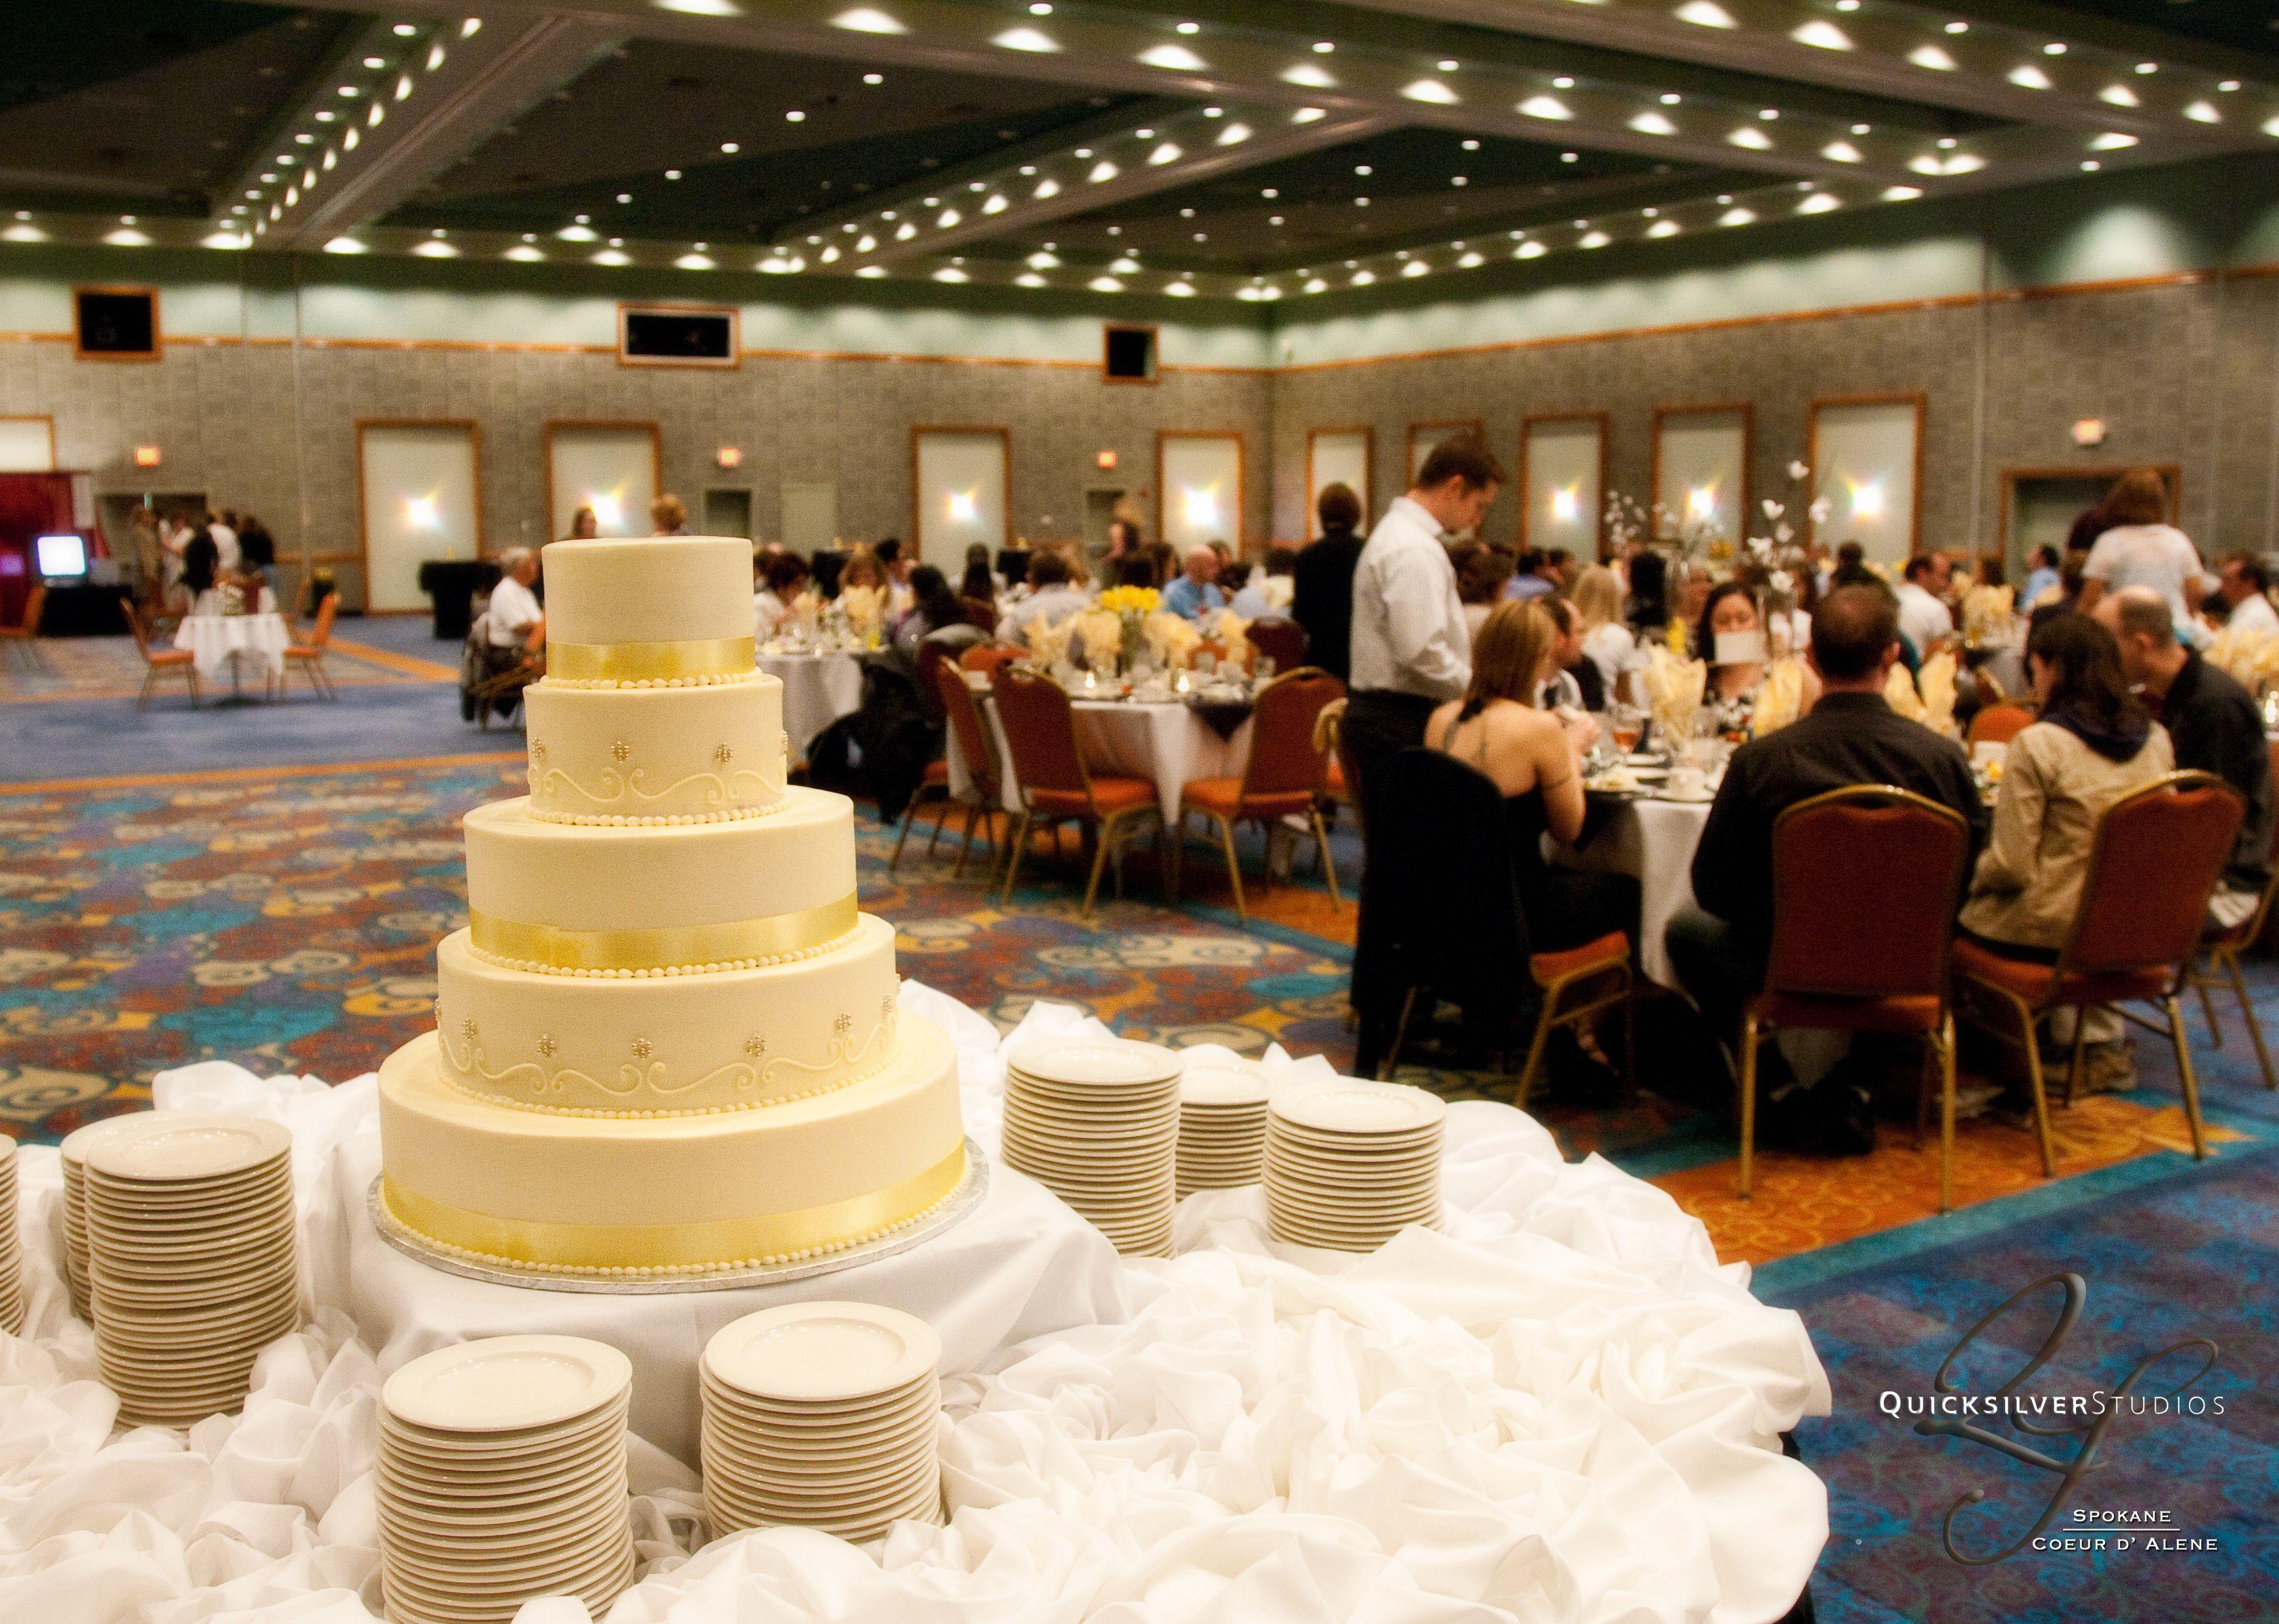 Northern Quest Resort & Caisno #Spokane #wedding | Celebrations ...